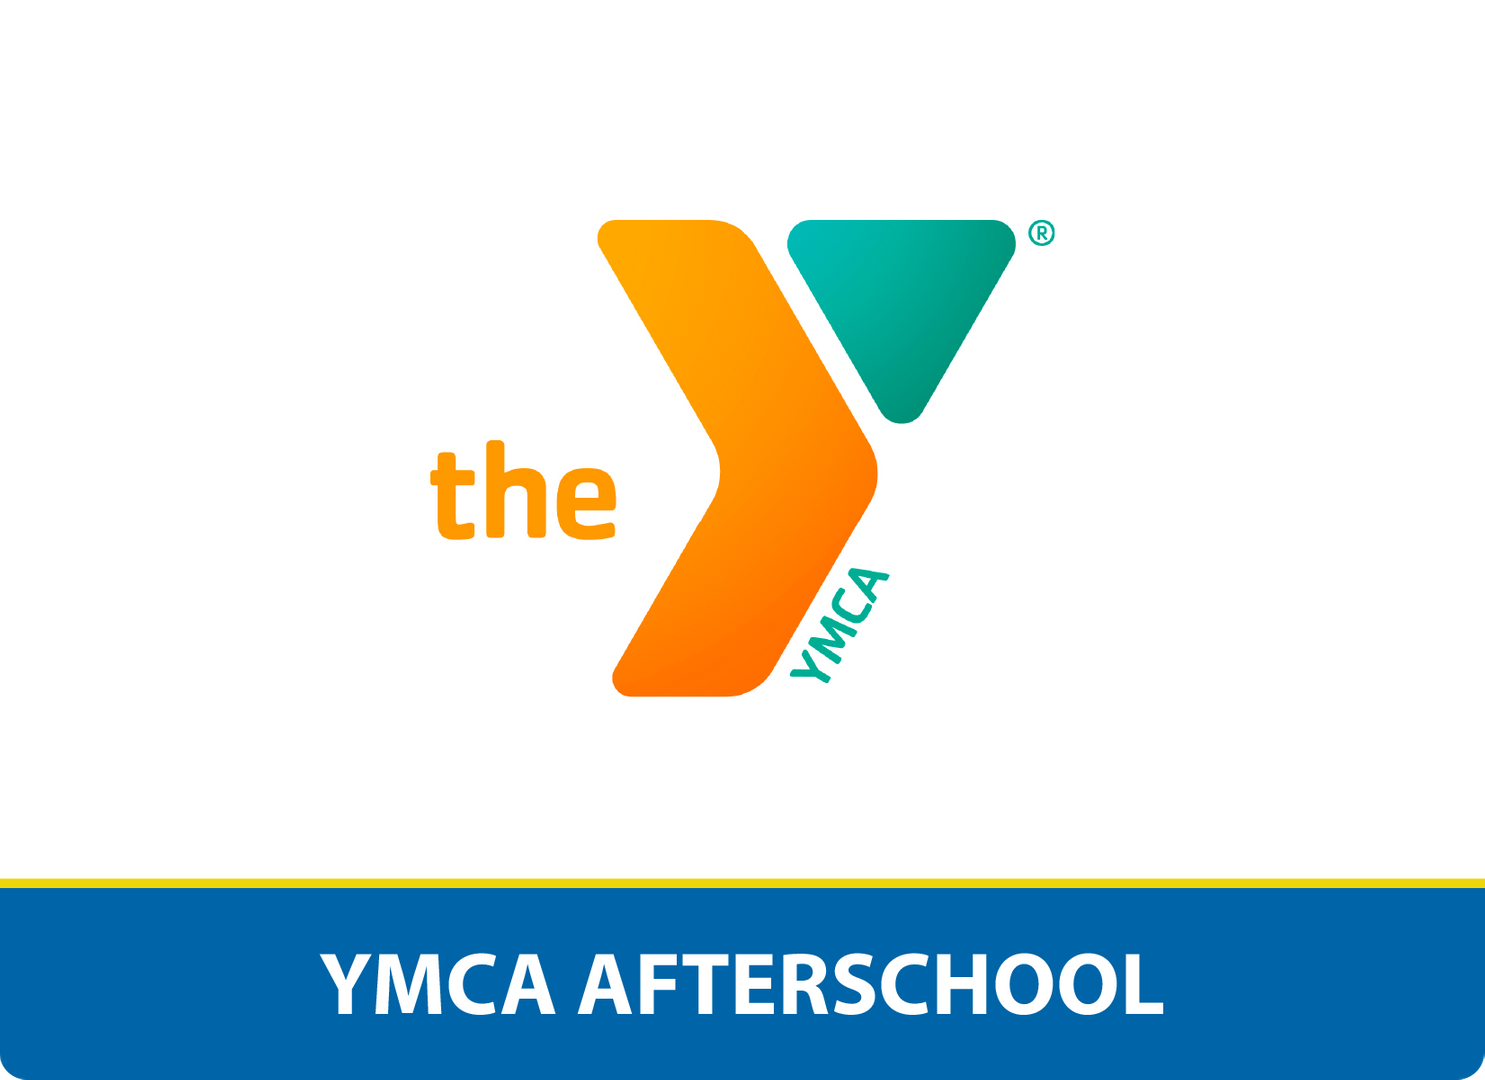 YMCA Afterschool: The YMCA logo